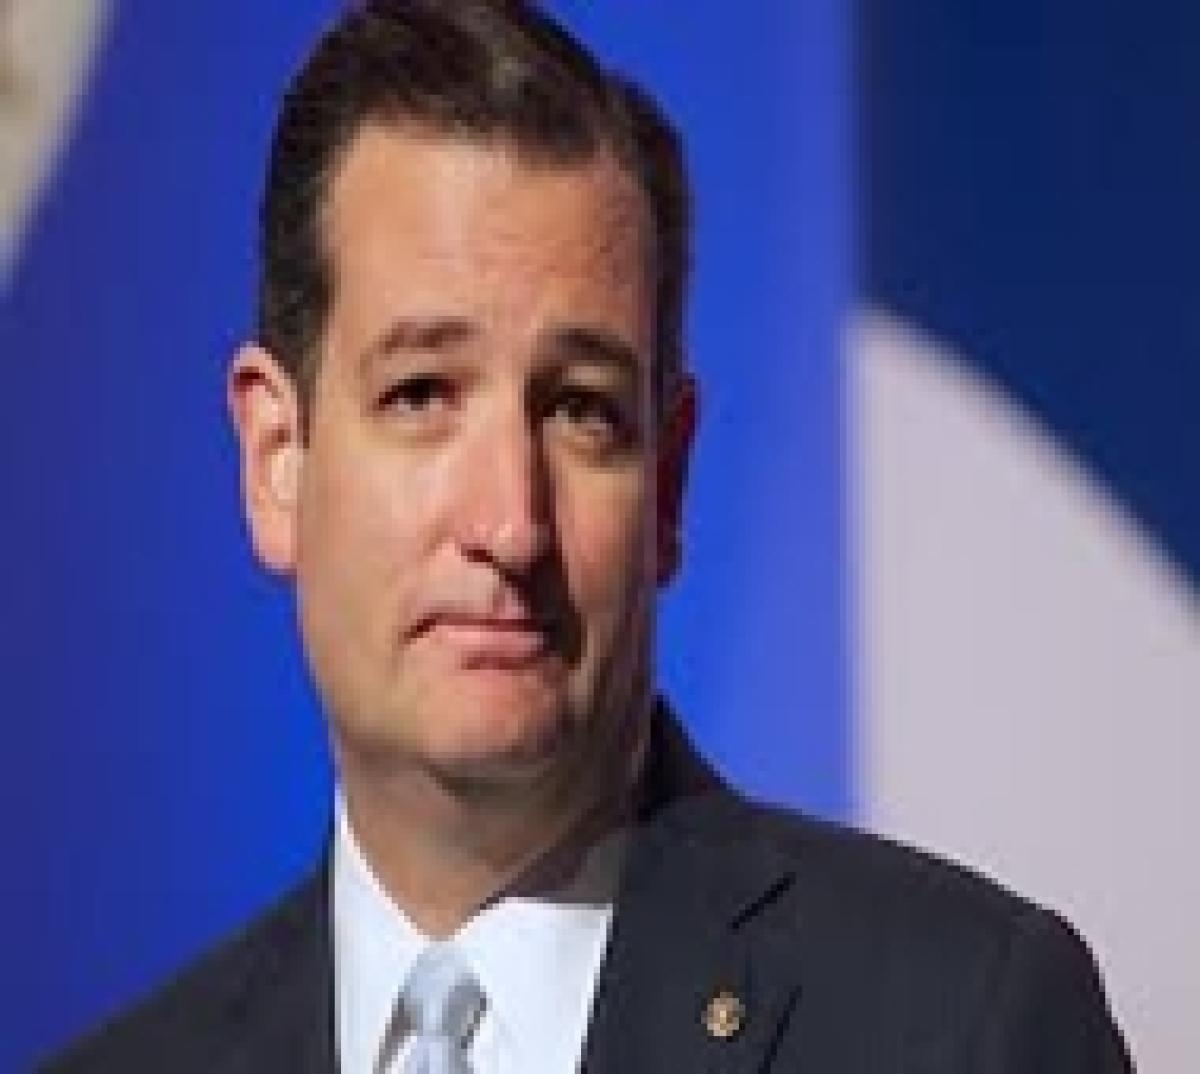 Former US House speaker: Cruz is 'Lucifer in the flesh'